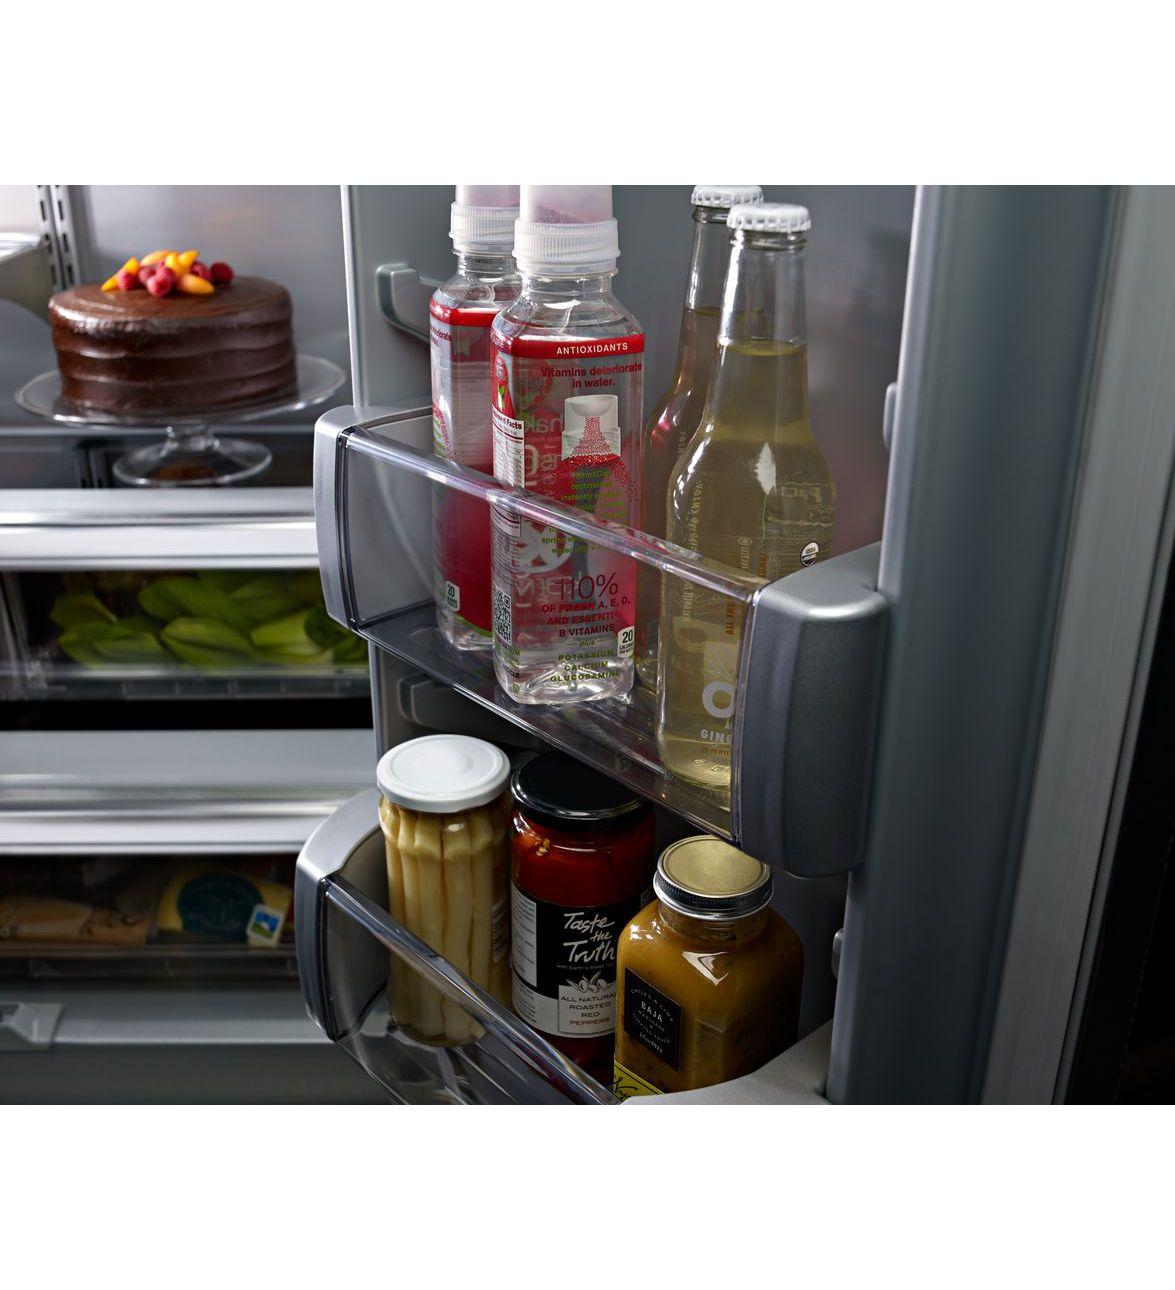 Kitchenaid kbfn506epa 36 20 8 cu ft built in panel - Kitchenaid refrigerator platinum interior ...